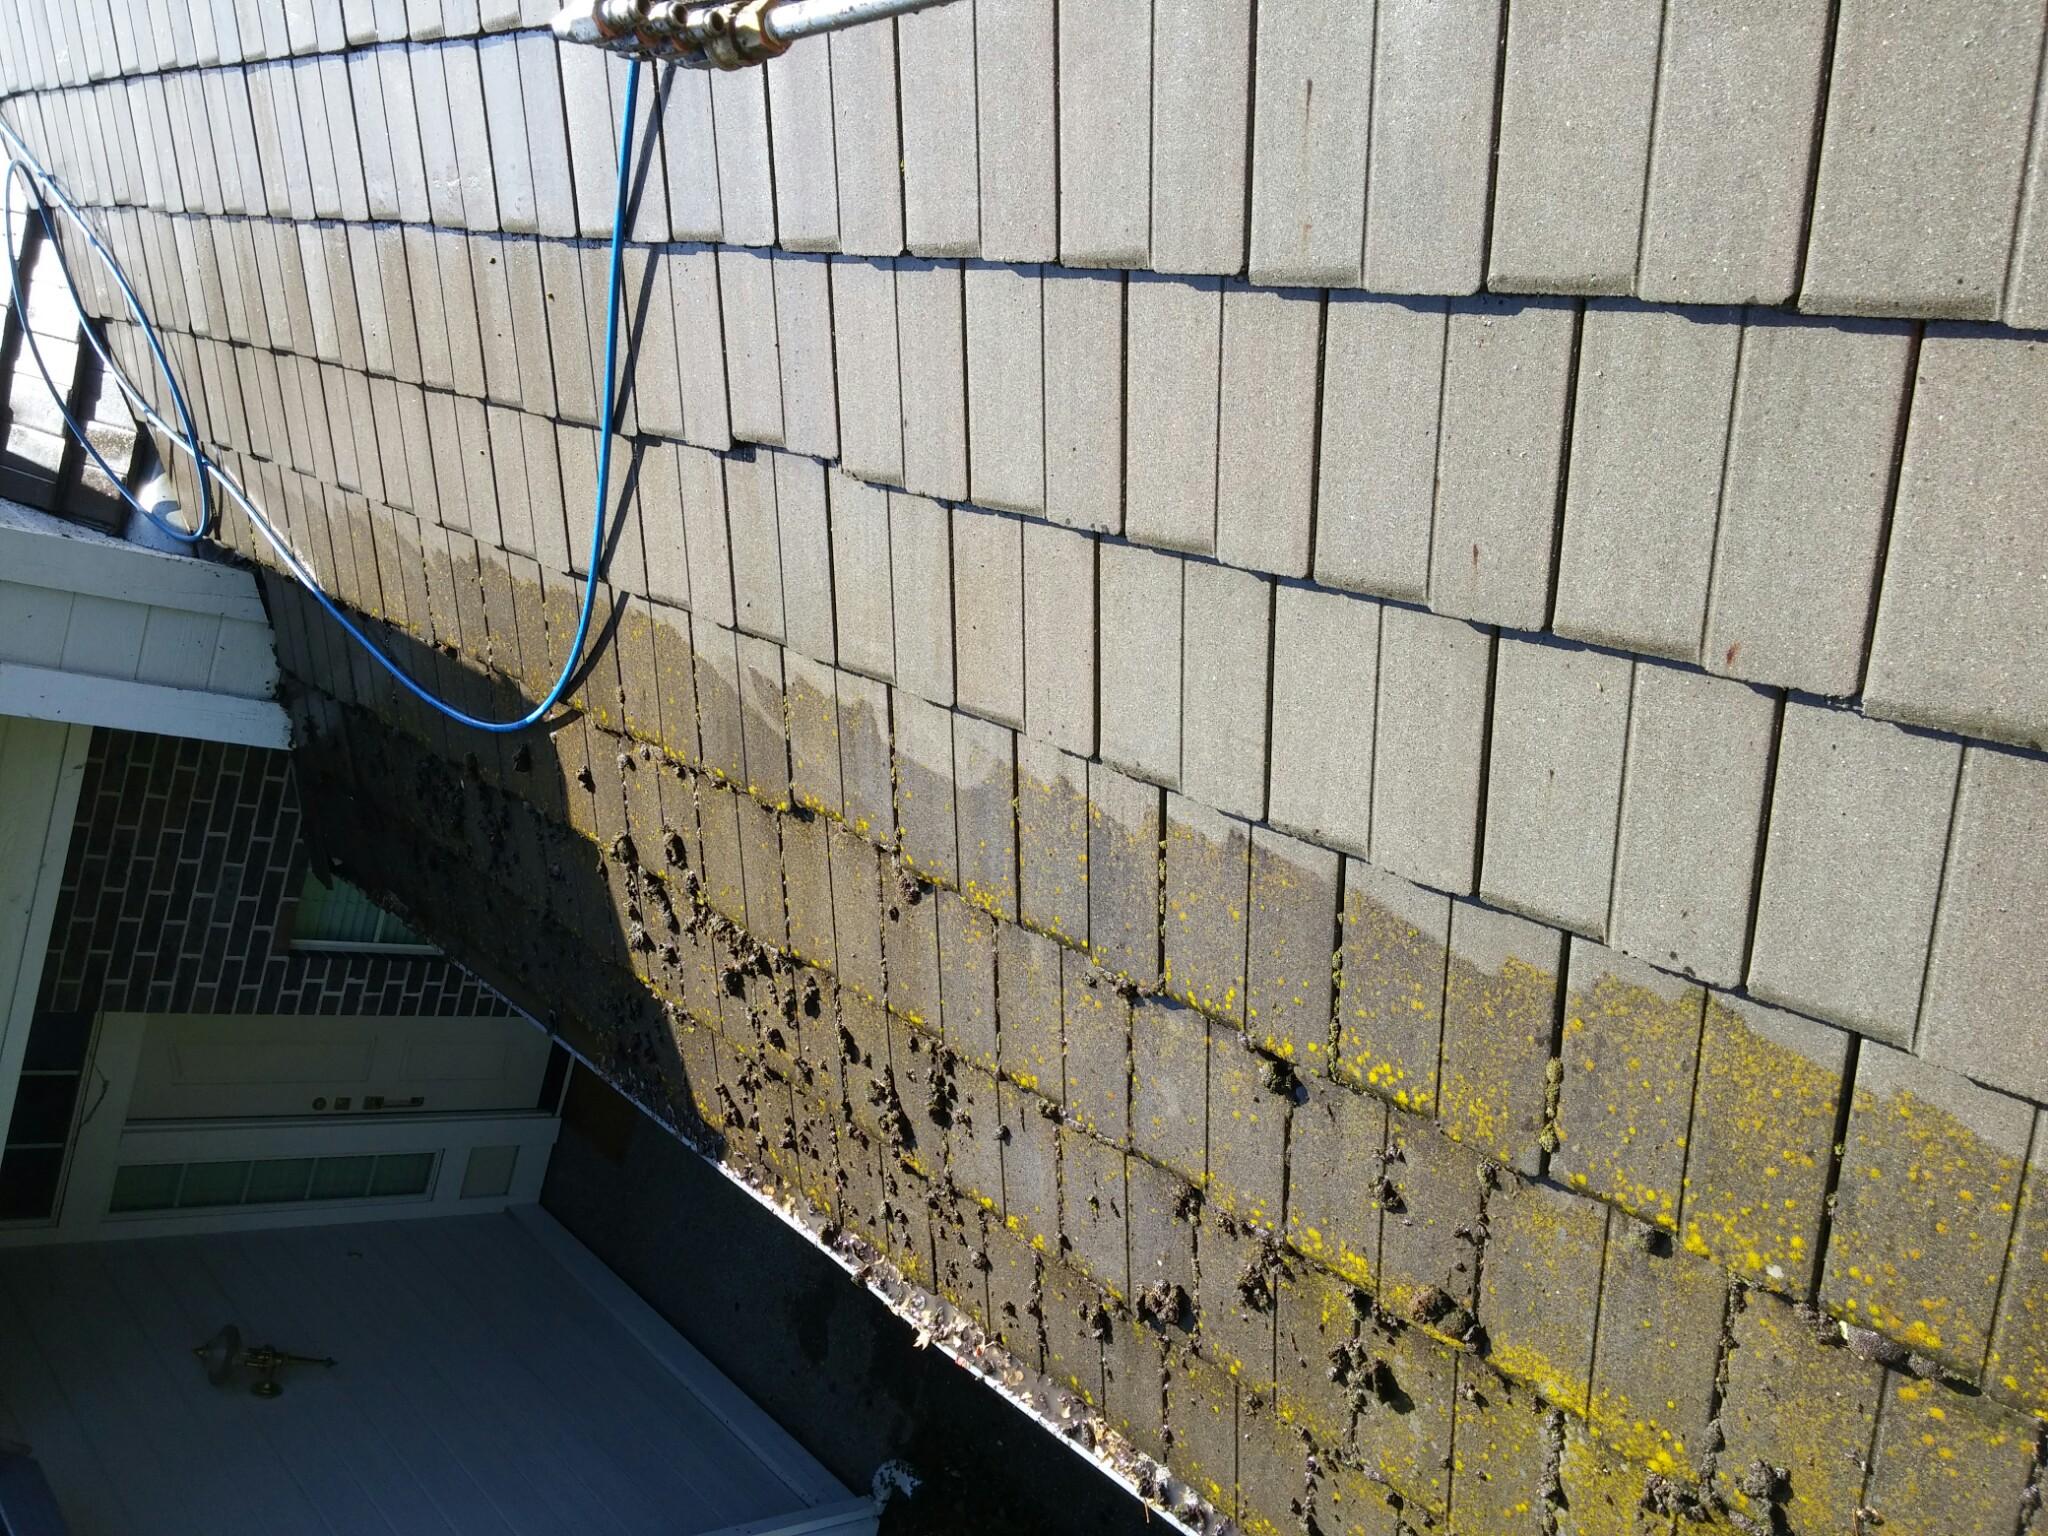 Tile Roof Cleaning In Elk Grove, CA